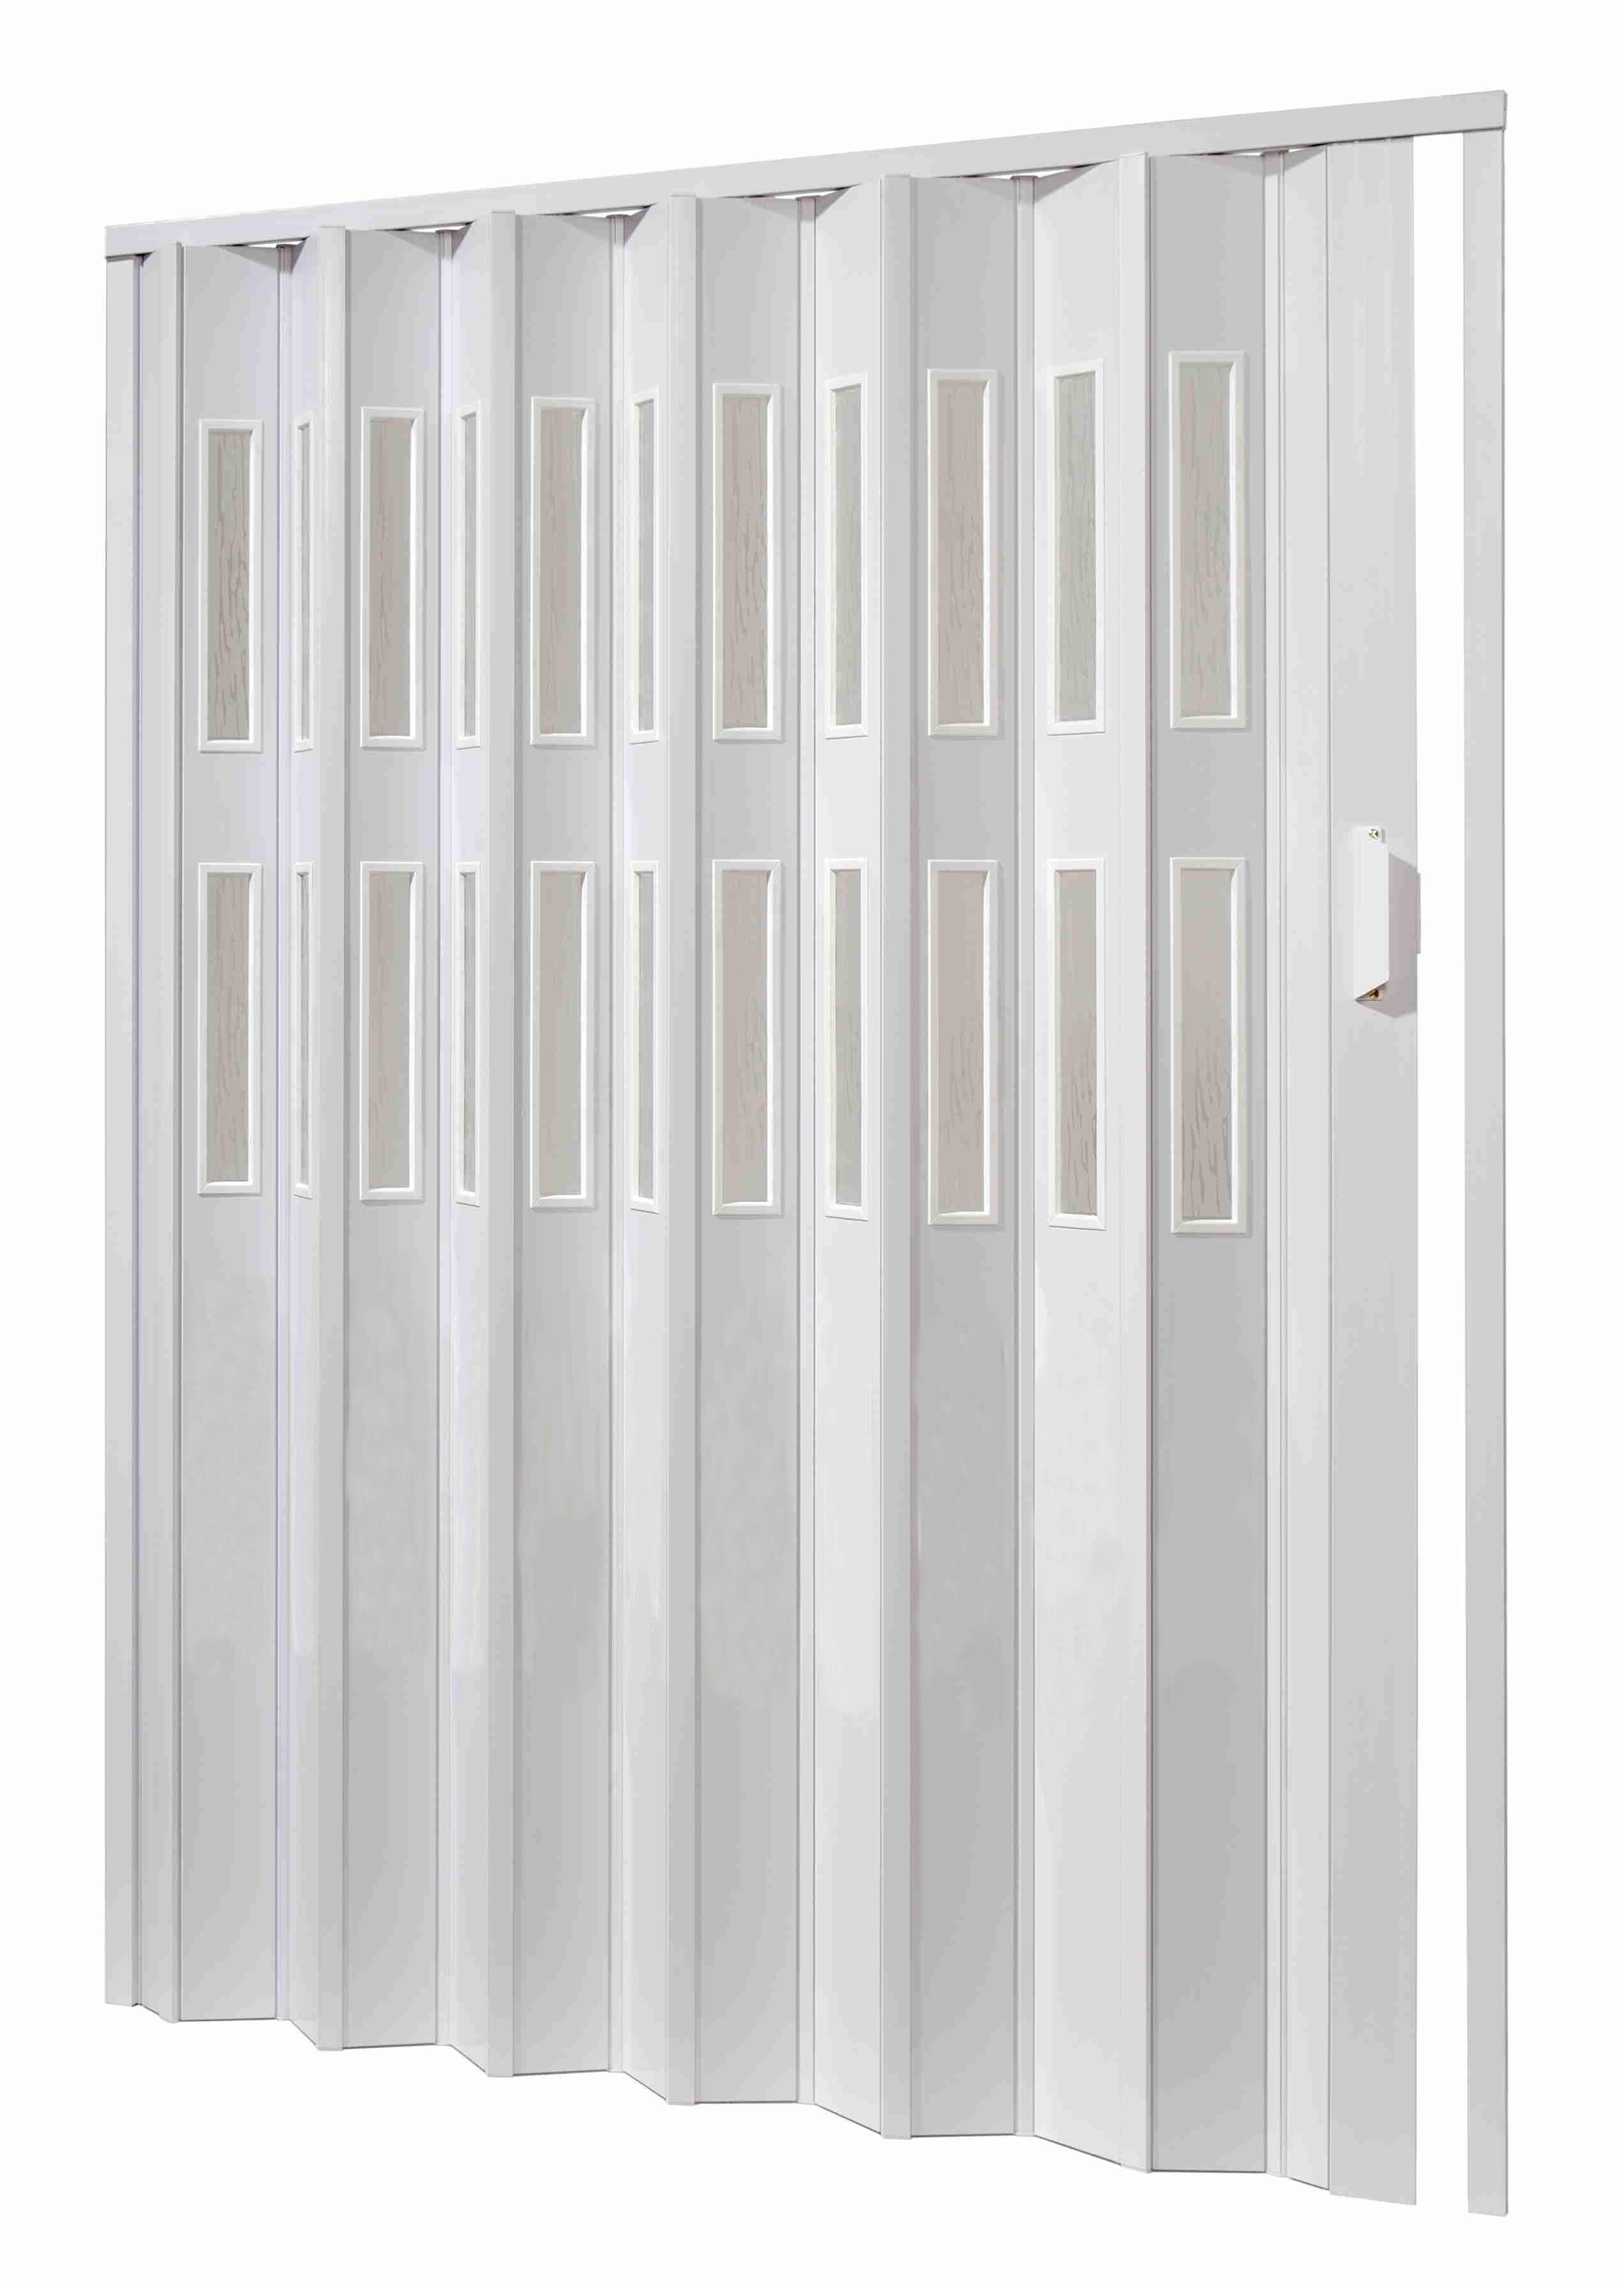 Shrnovací dveře plné bílé 145x200cm ODSTÍN: BÍLÁ, TYP DVEŘÍ: plné